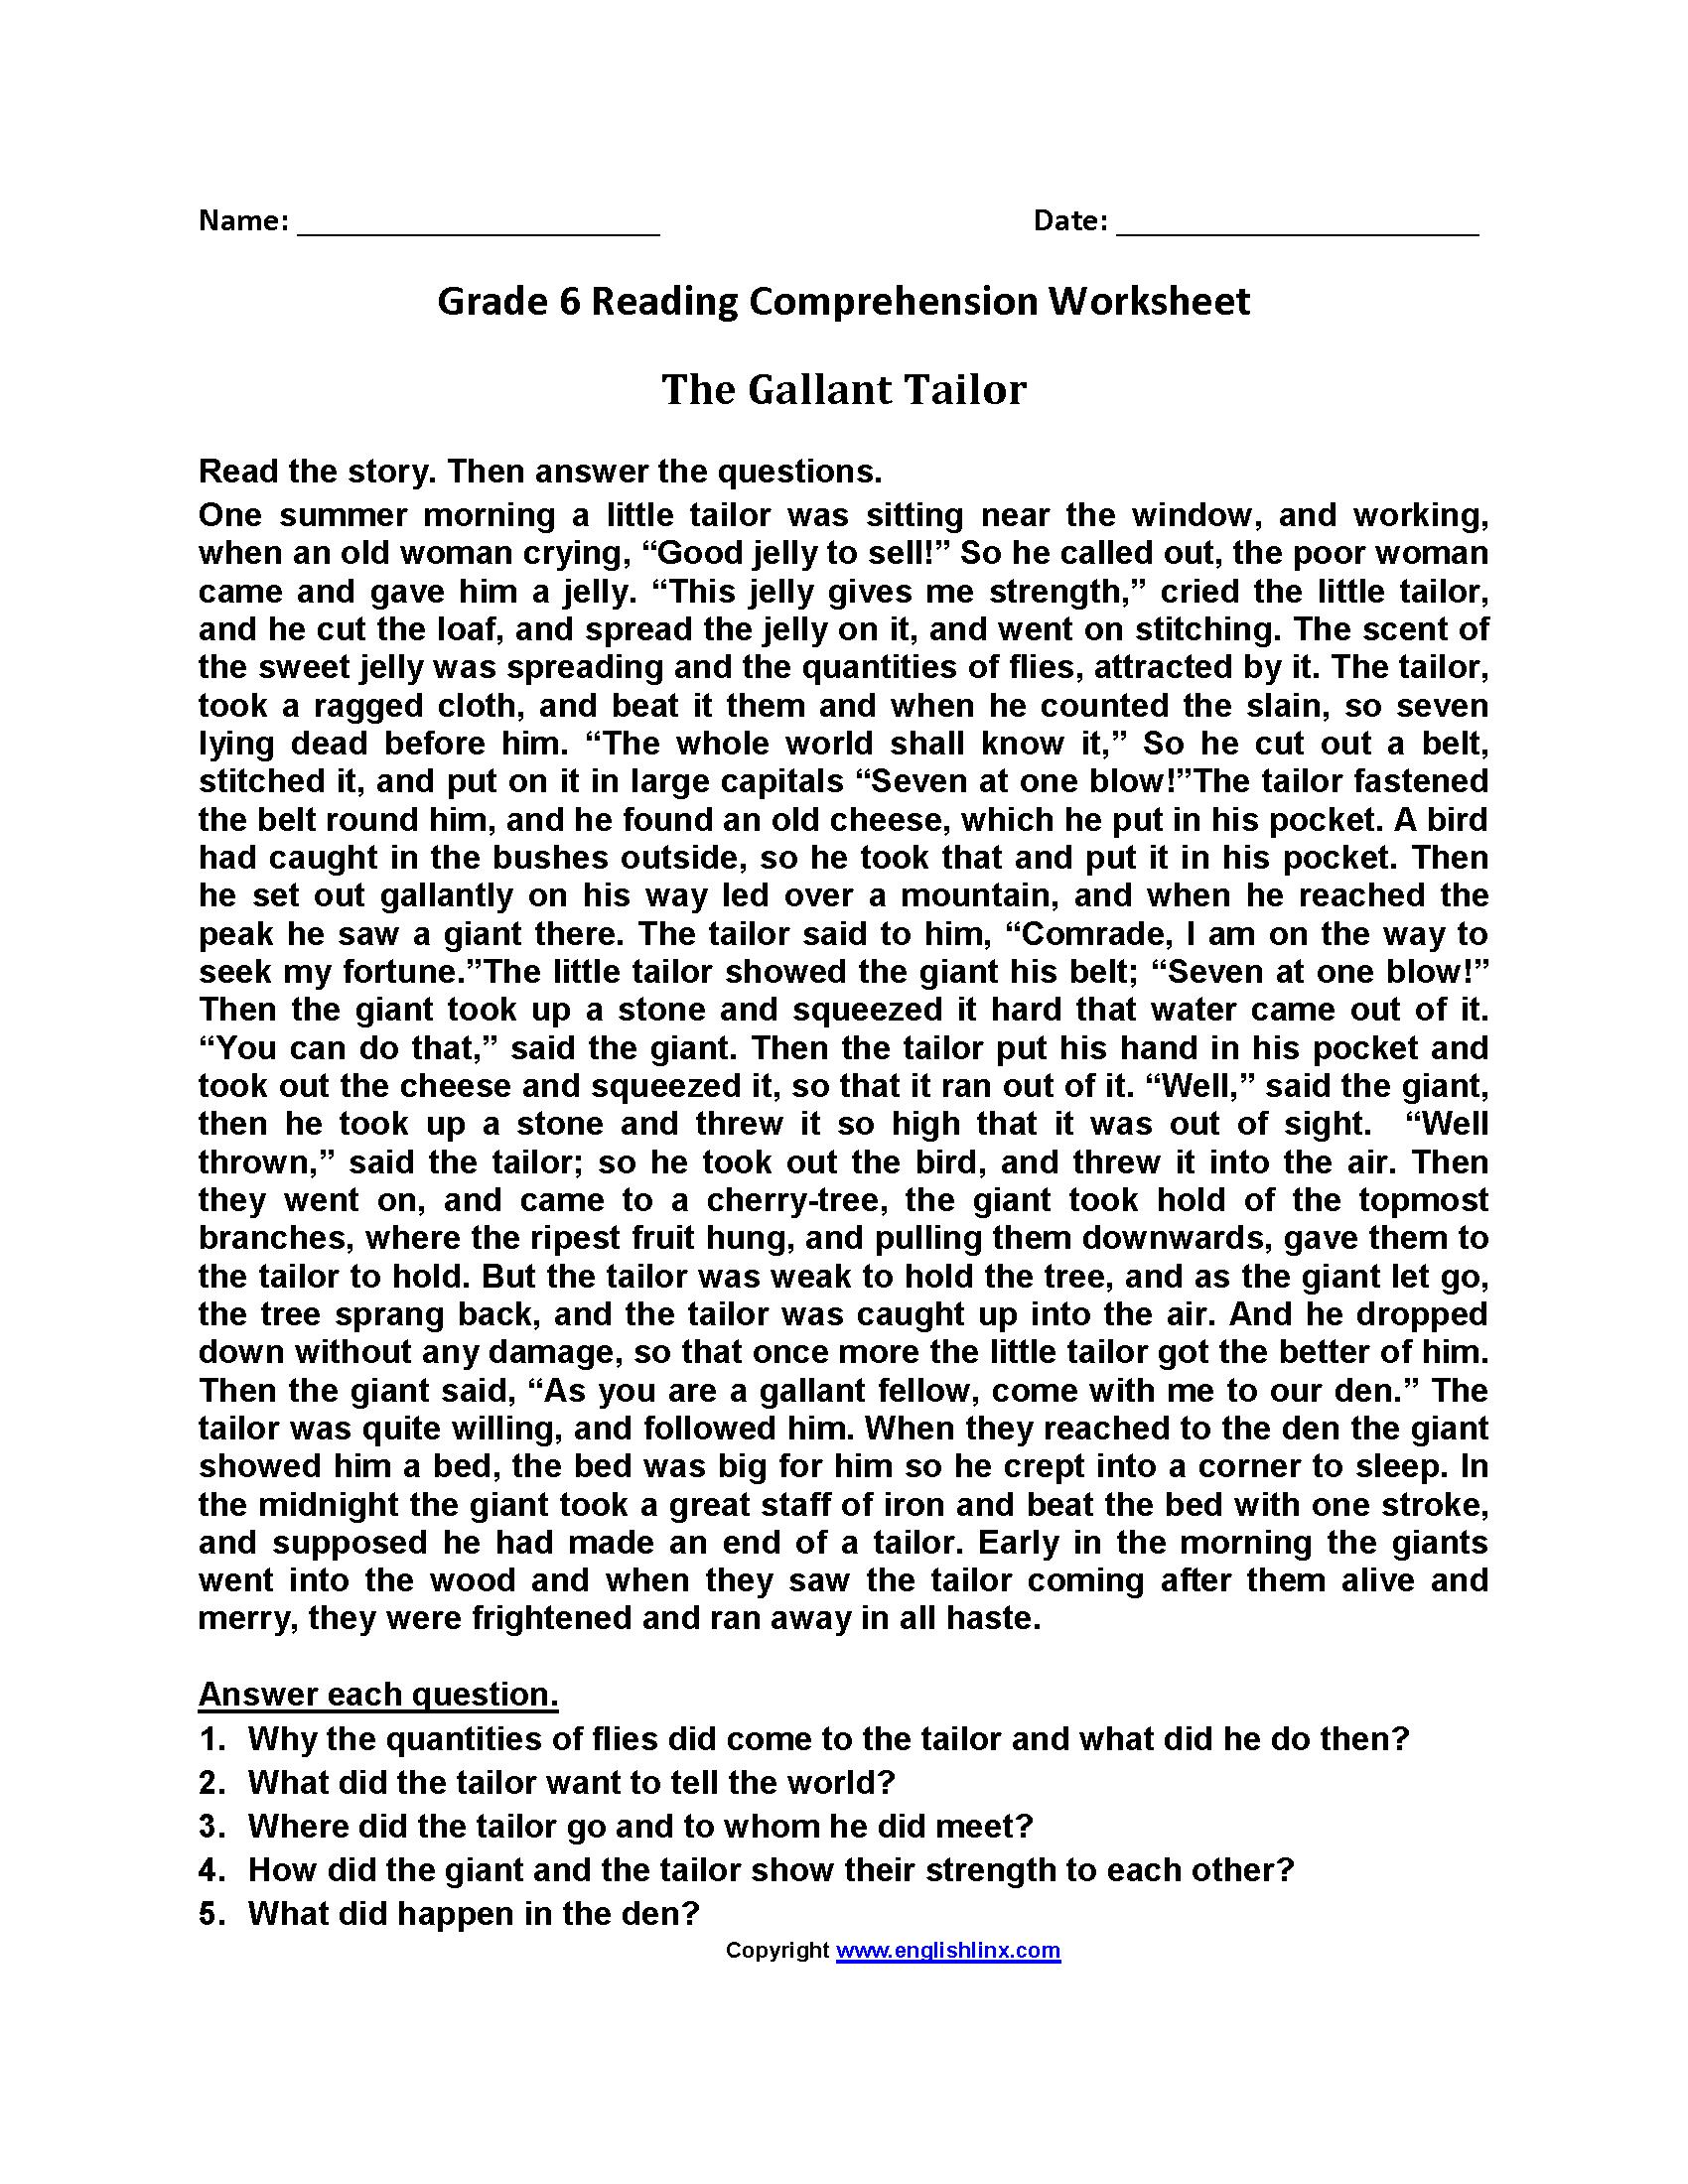 hight resolution of The Gallant Tailor\u003cbr\u003eSixth Grade Reading Worksheets   Reading  comprehension worksheets